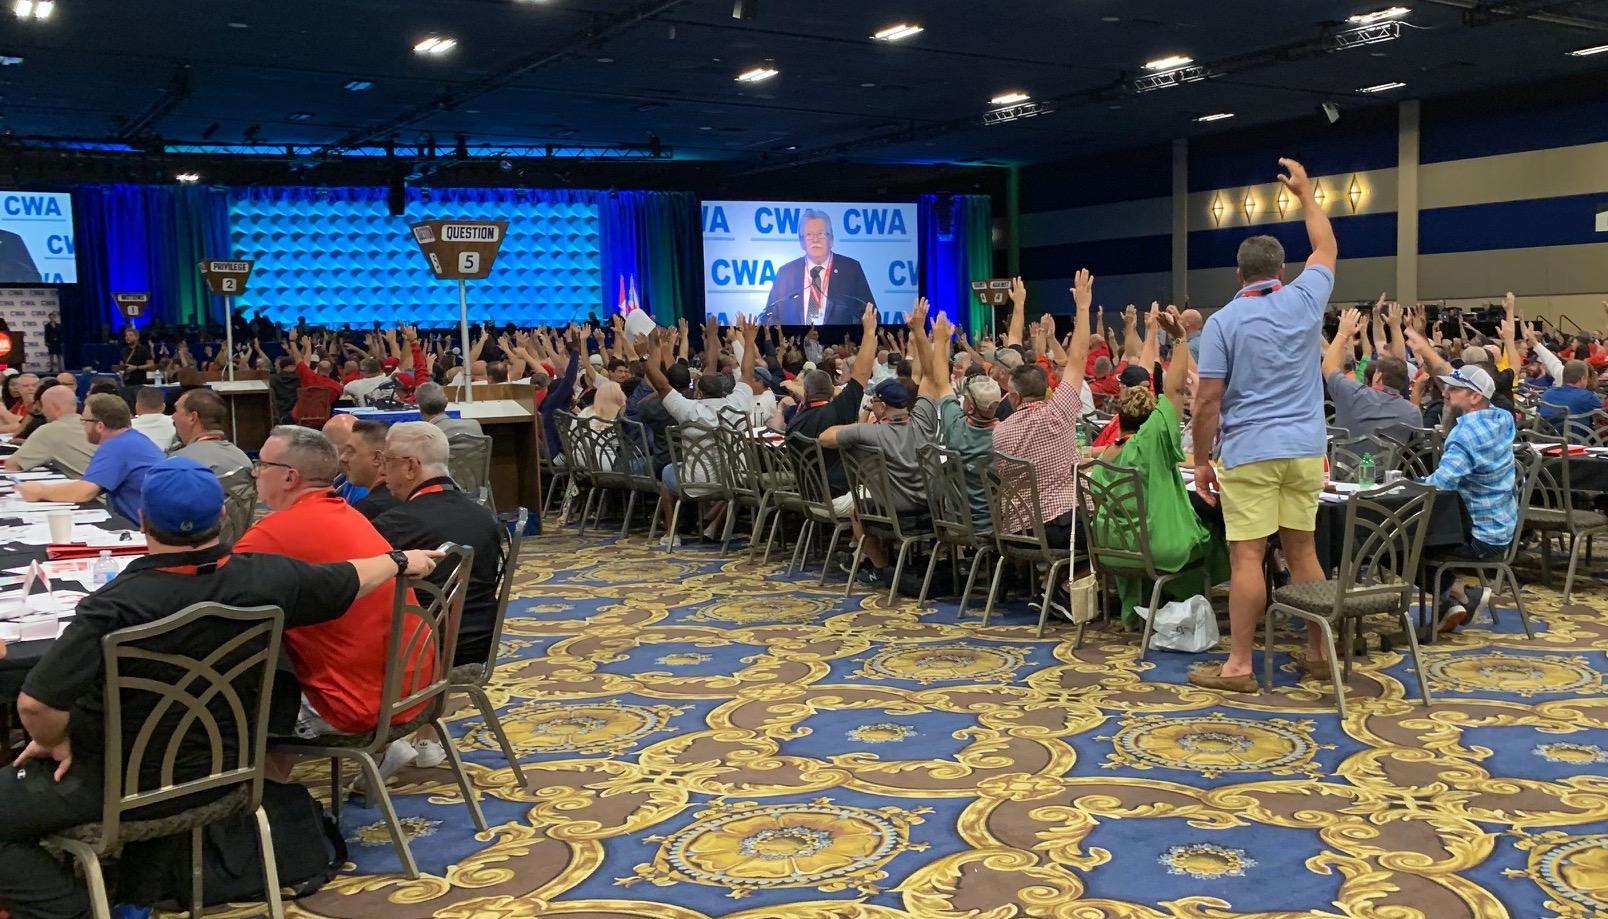 CWA delegates vote in favor of postponing sector dissolution indefinitely.